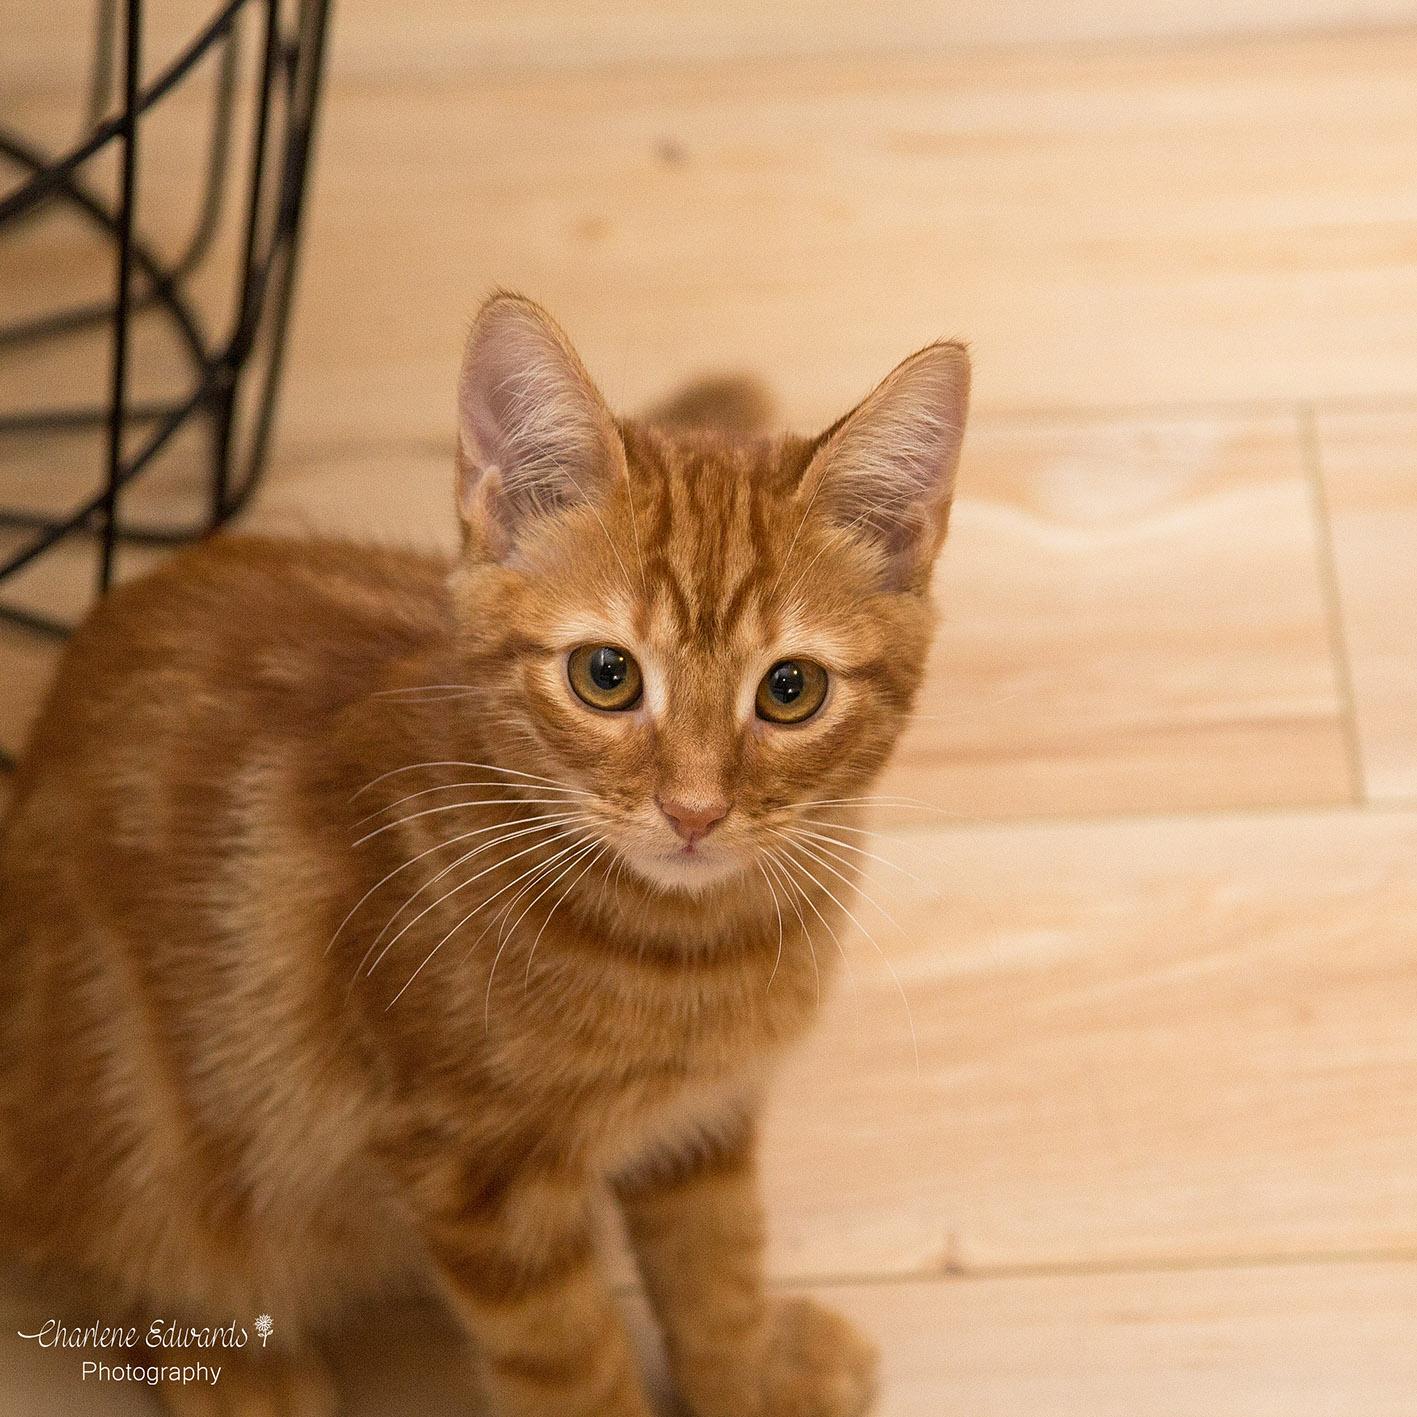 Bj Sweet Ginger Kitten Pending Adoption Male Domestic Short Hair Mix Cat In Nsw Petrescue